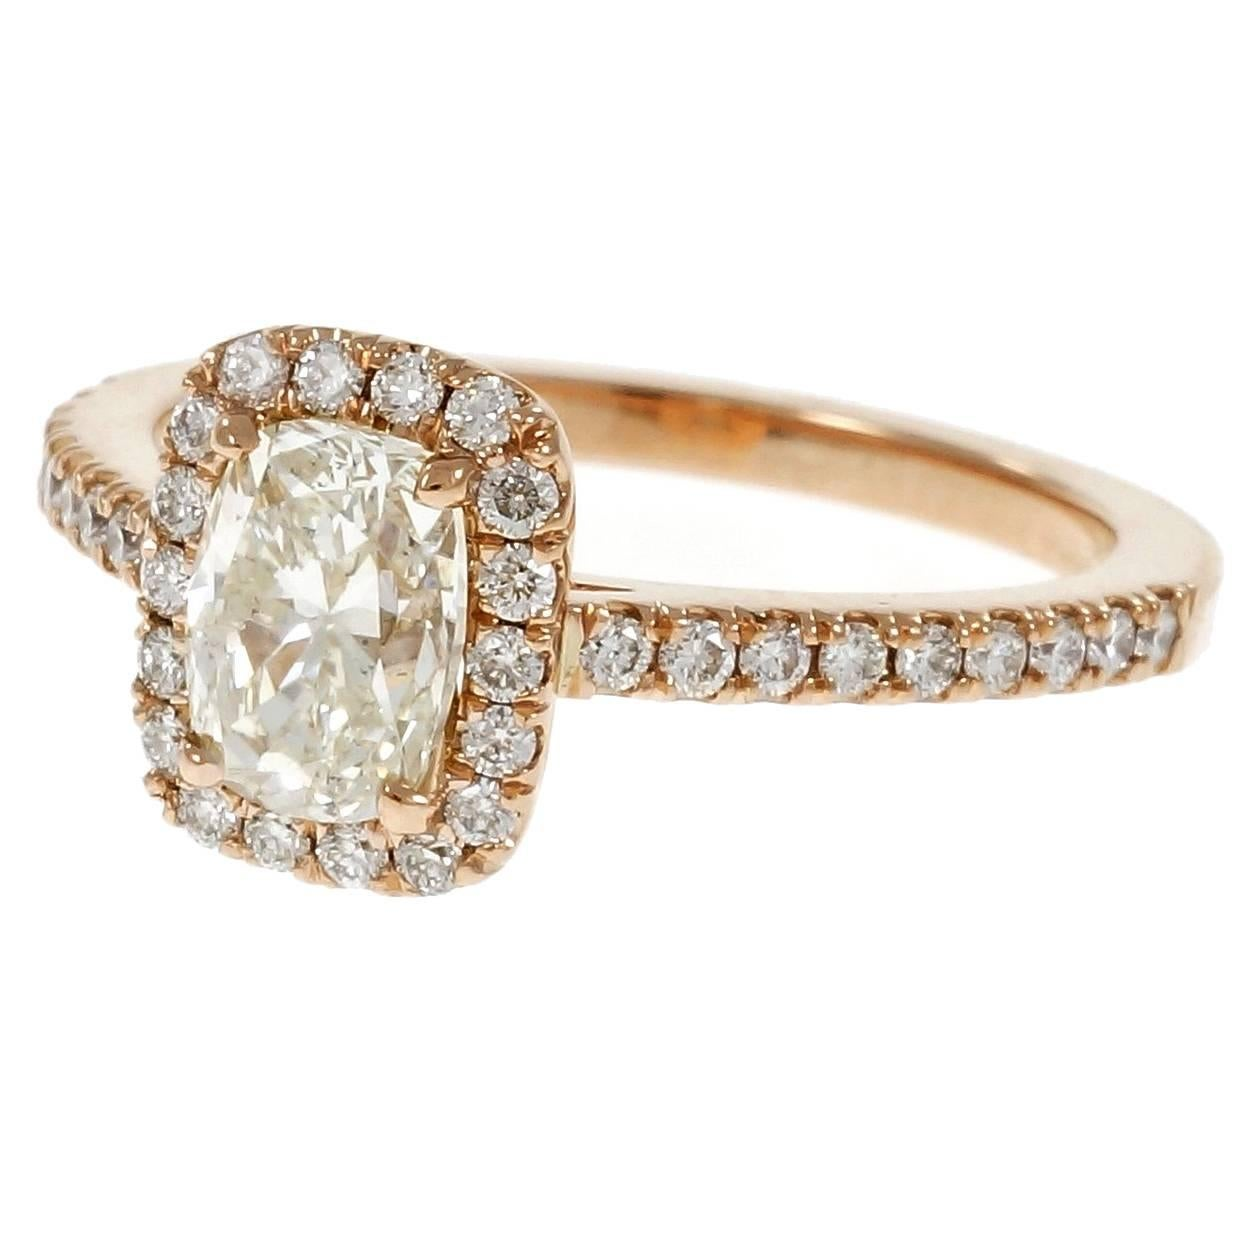 Peter Suchy .90 Carat Cushion Cut Diamond Halo Rose Gold Engagement Ring